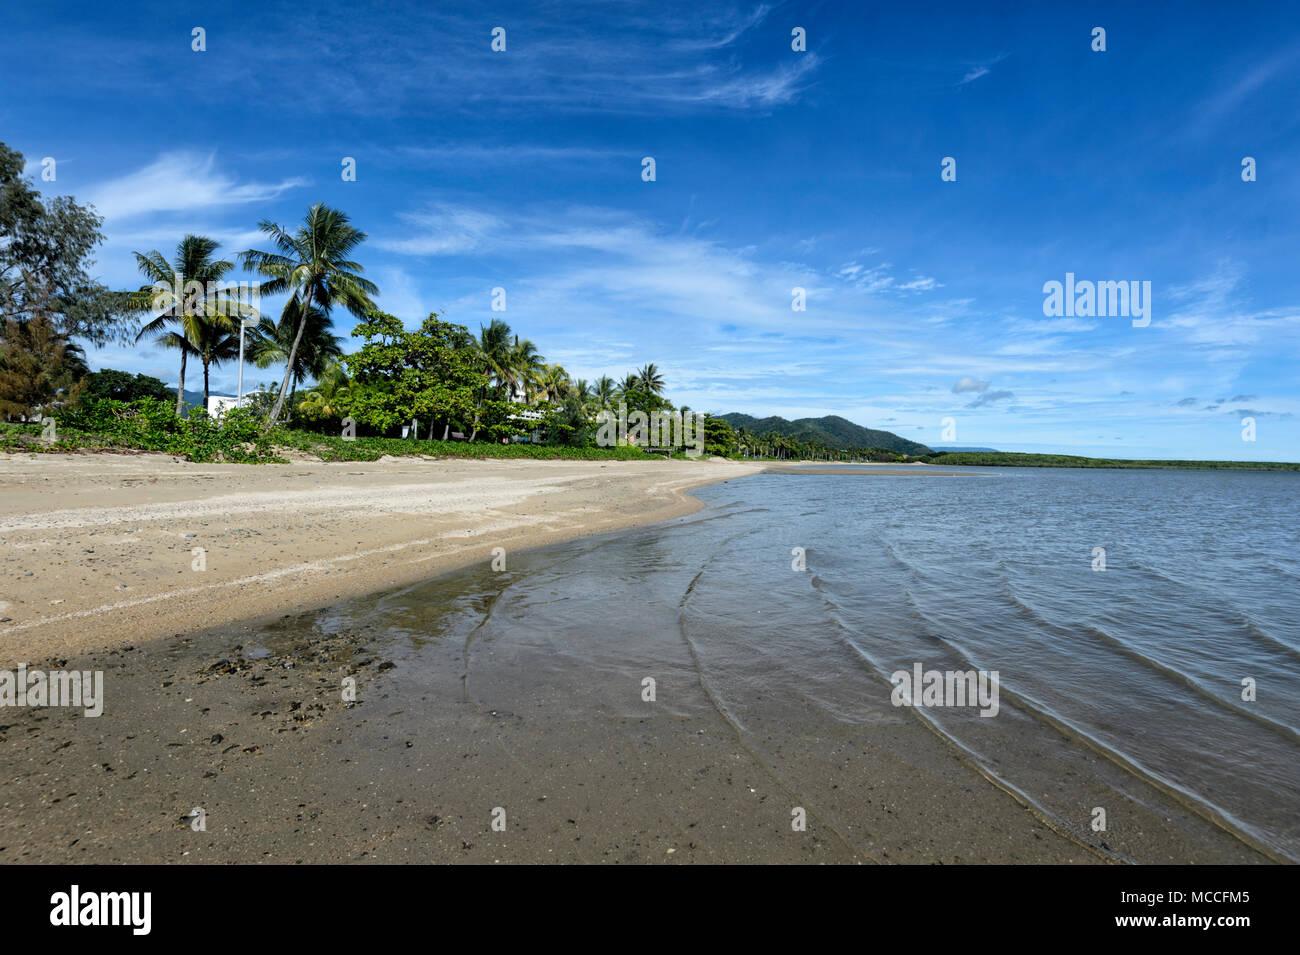 Sandstrand in Cairns center, Far North Queensland, FNQ, QLD, Australien Stockbild